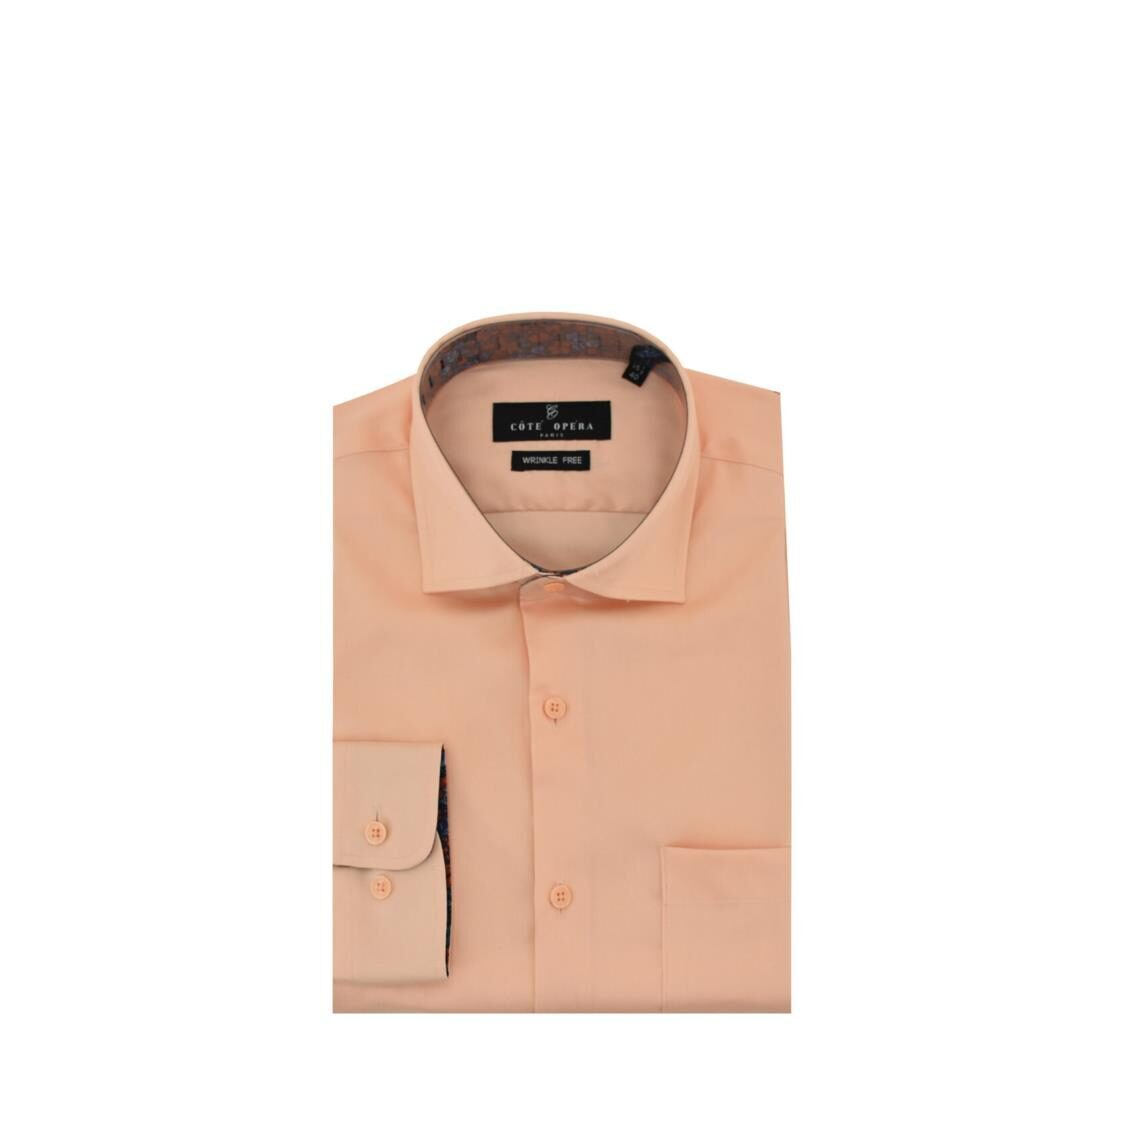 Cote Opera Long-Sleeved Shirt with Wrinkle-Free  Moist Cured finish - Orange